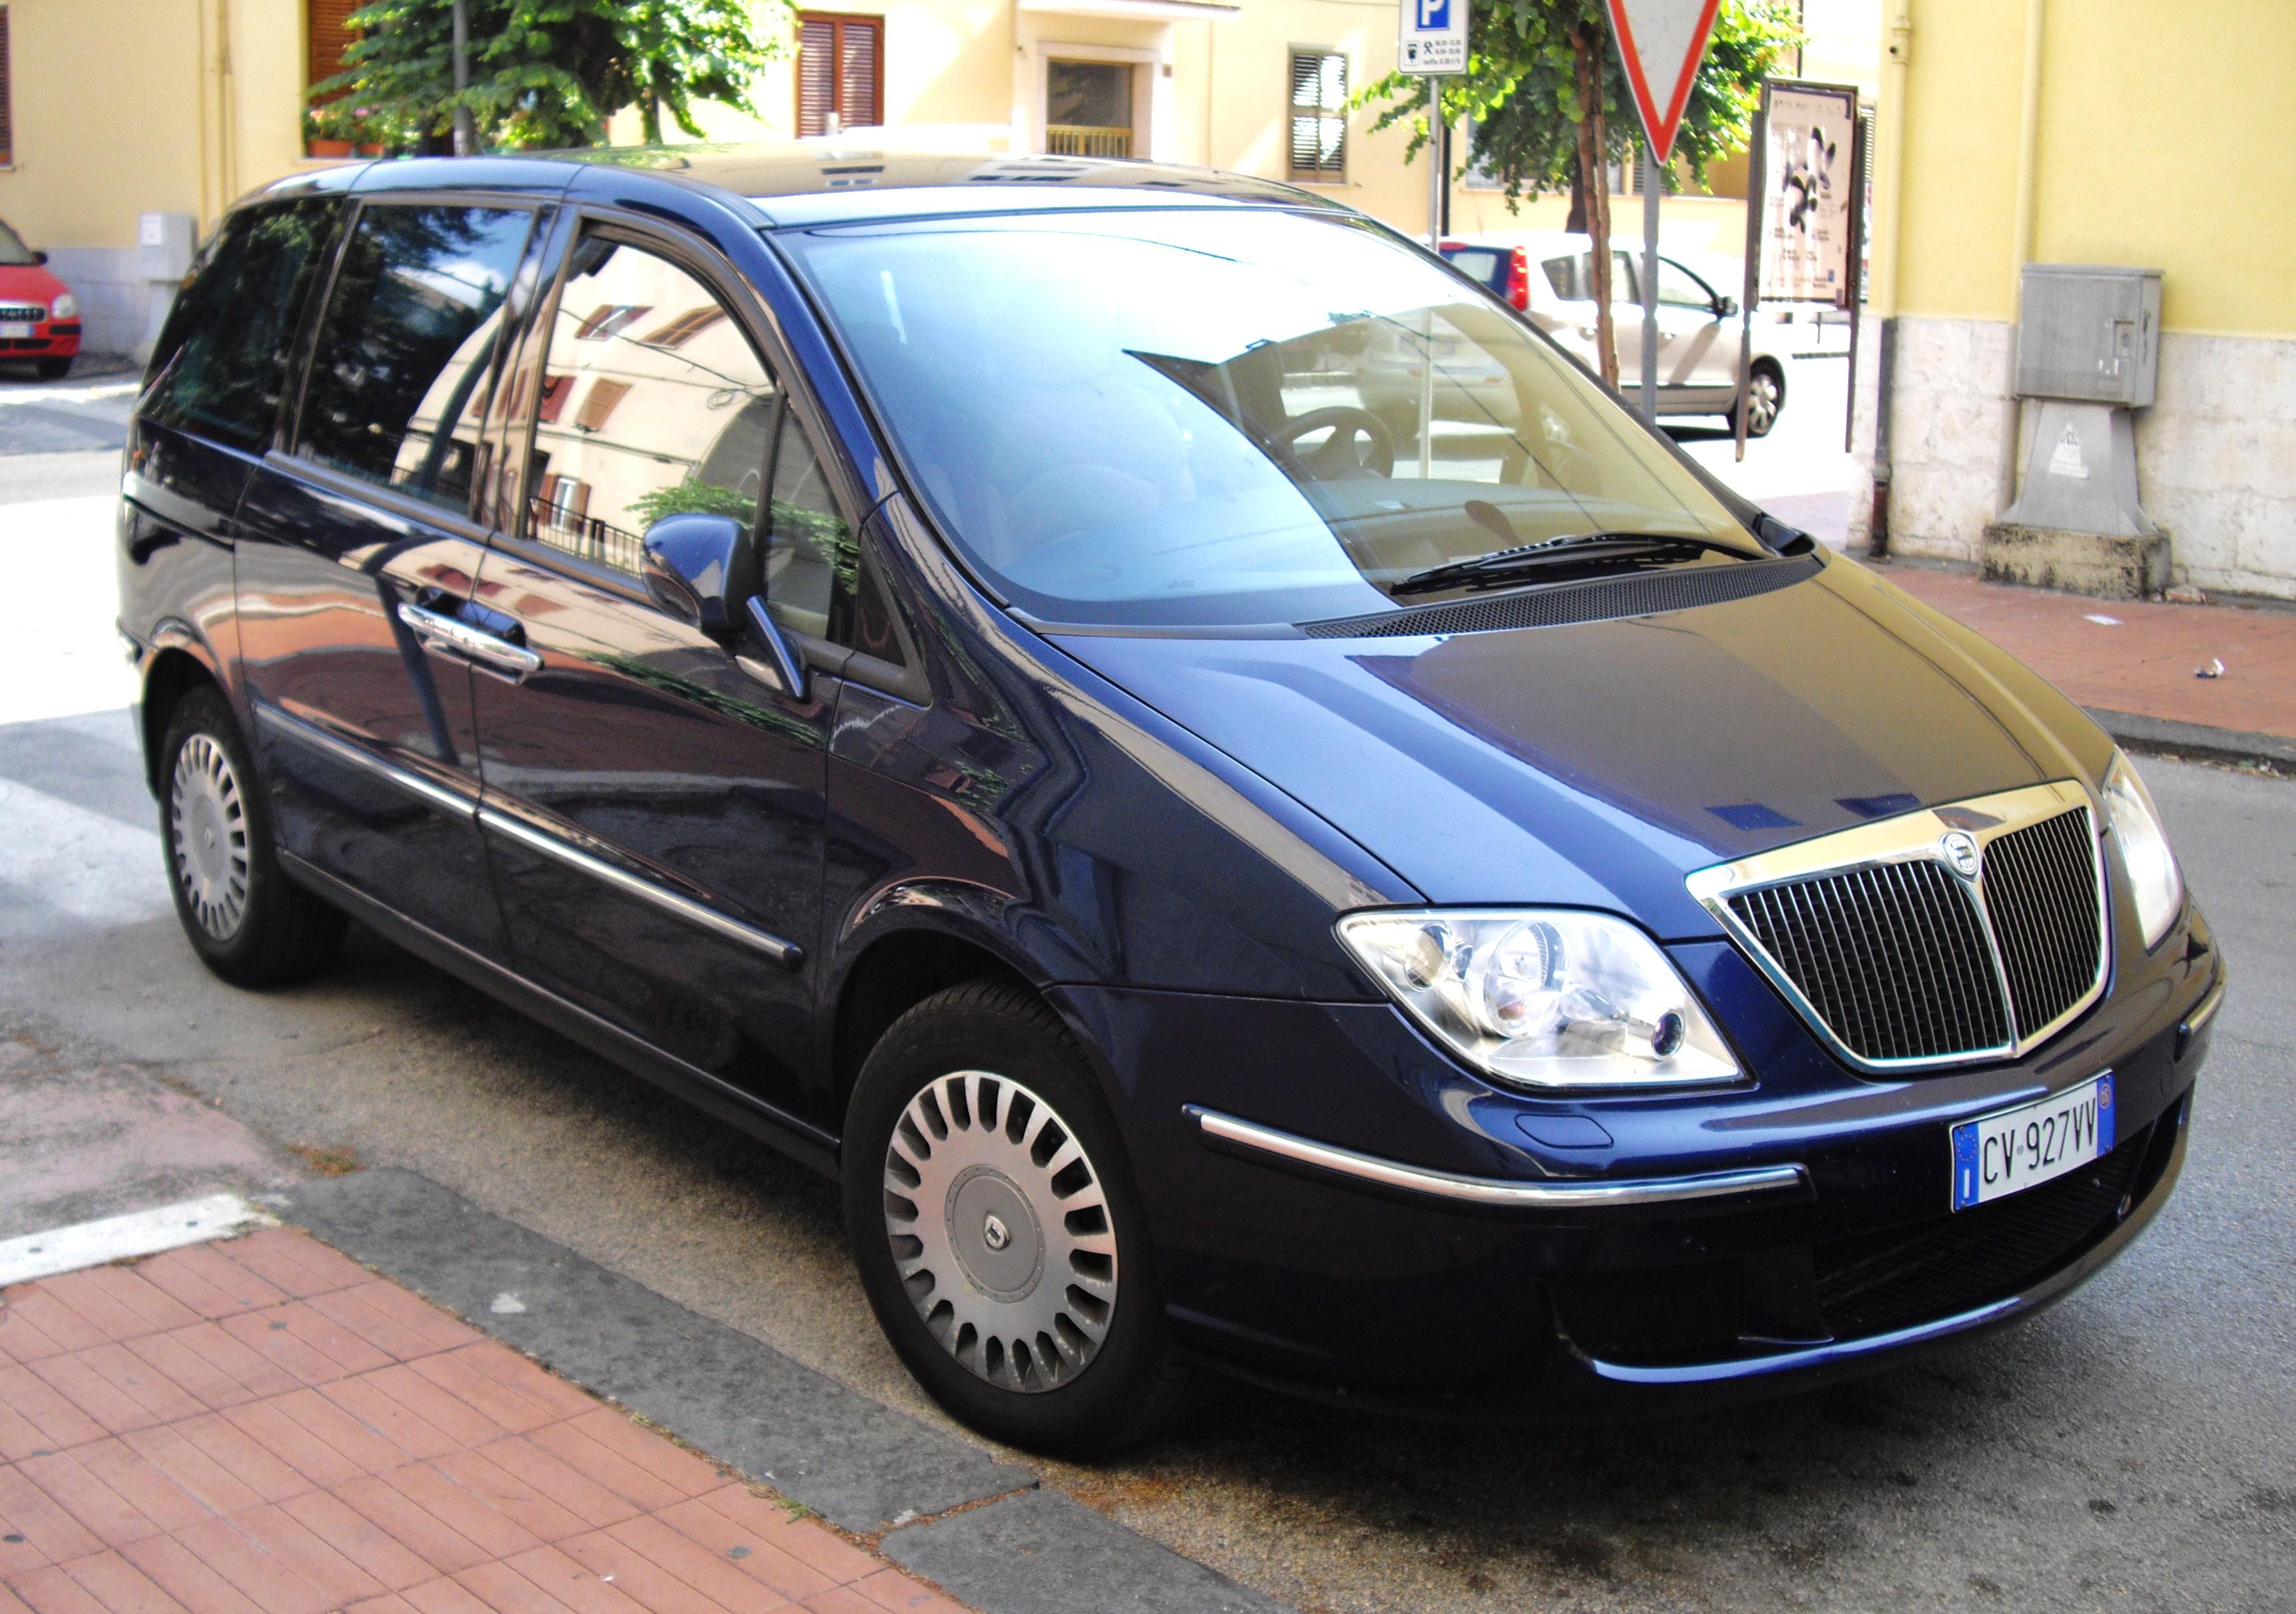 https://upload.wikimedia.org/wikipedia/commons/7/7e/2005_Lancia_Phedra_2.0_JTD.JPG